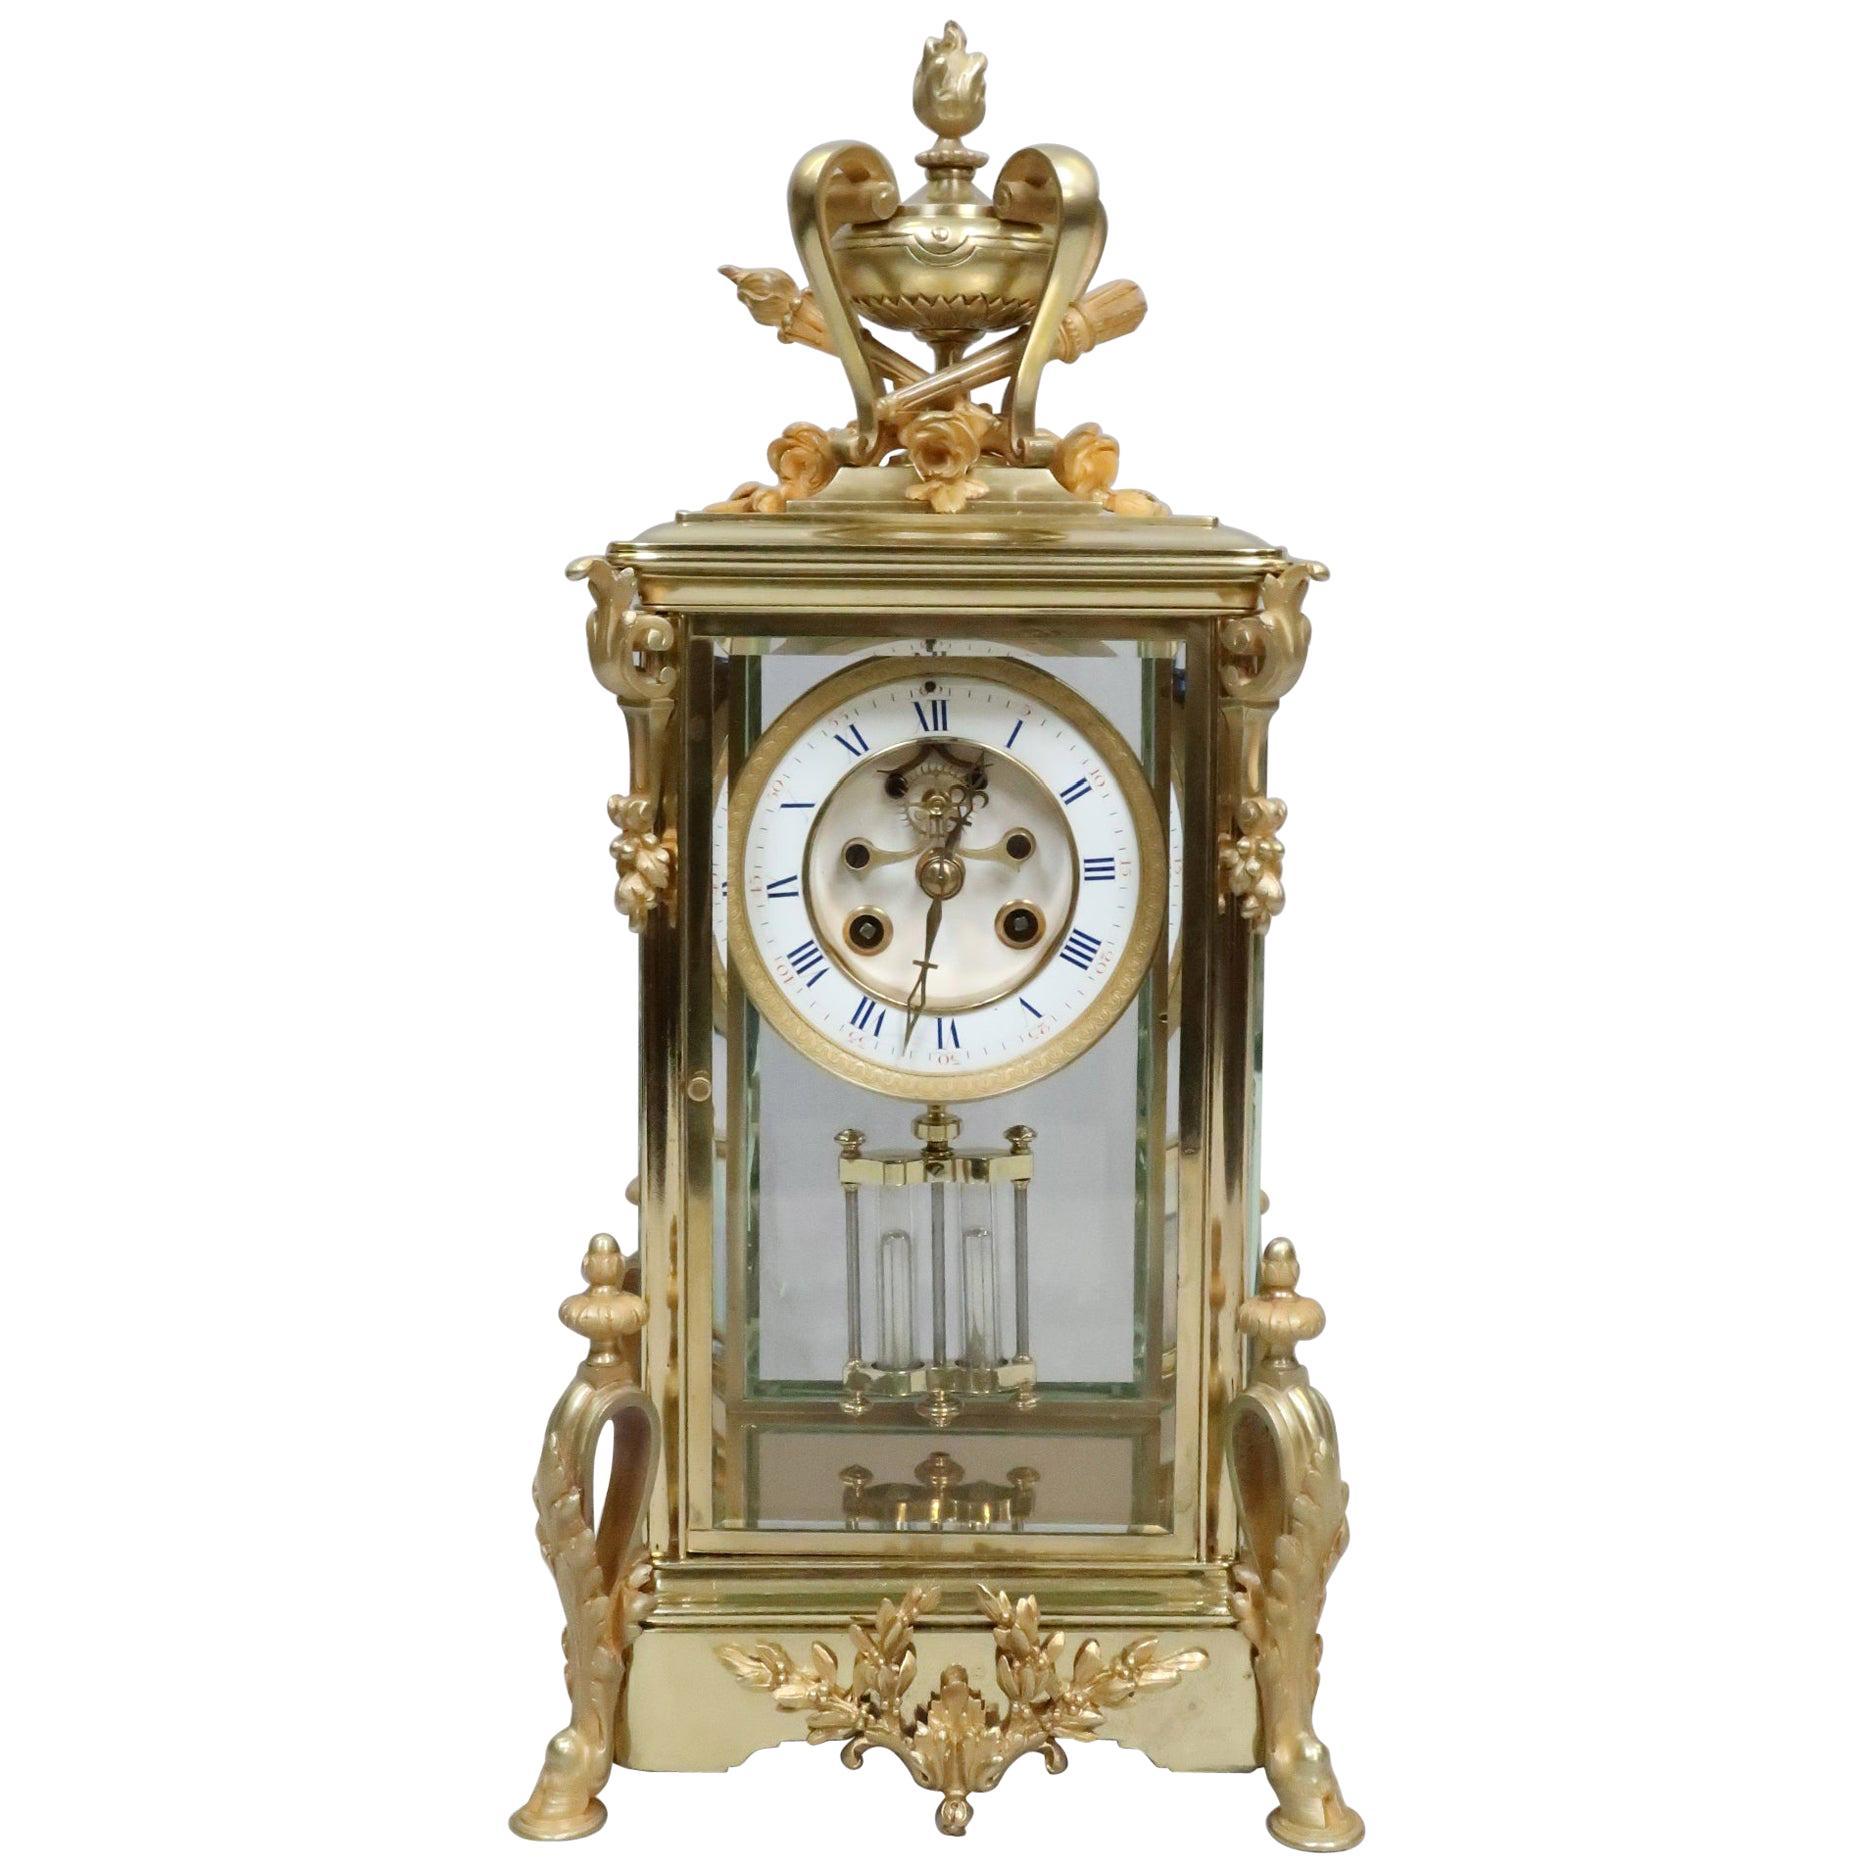 Handmade pendulum clock fine polished case 63 cm tall